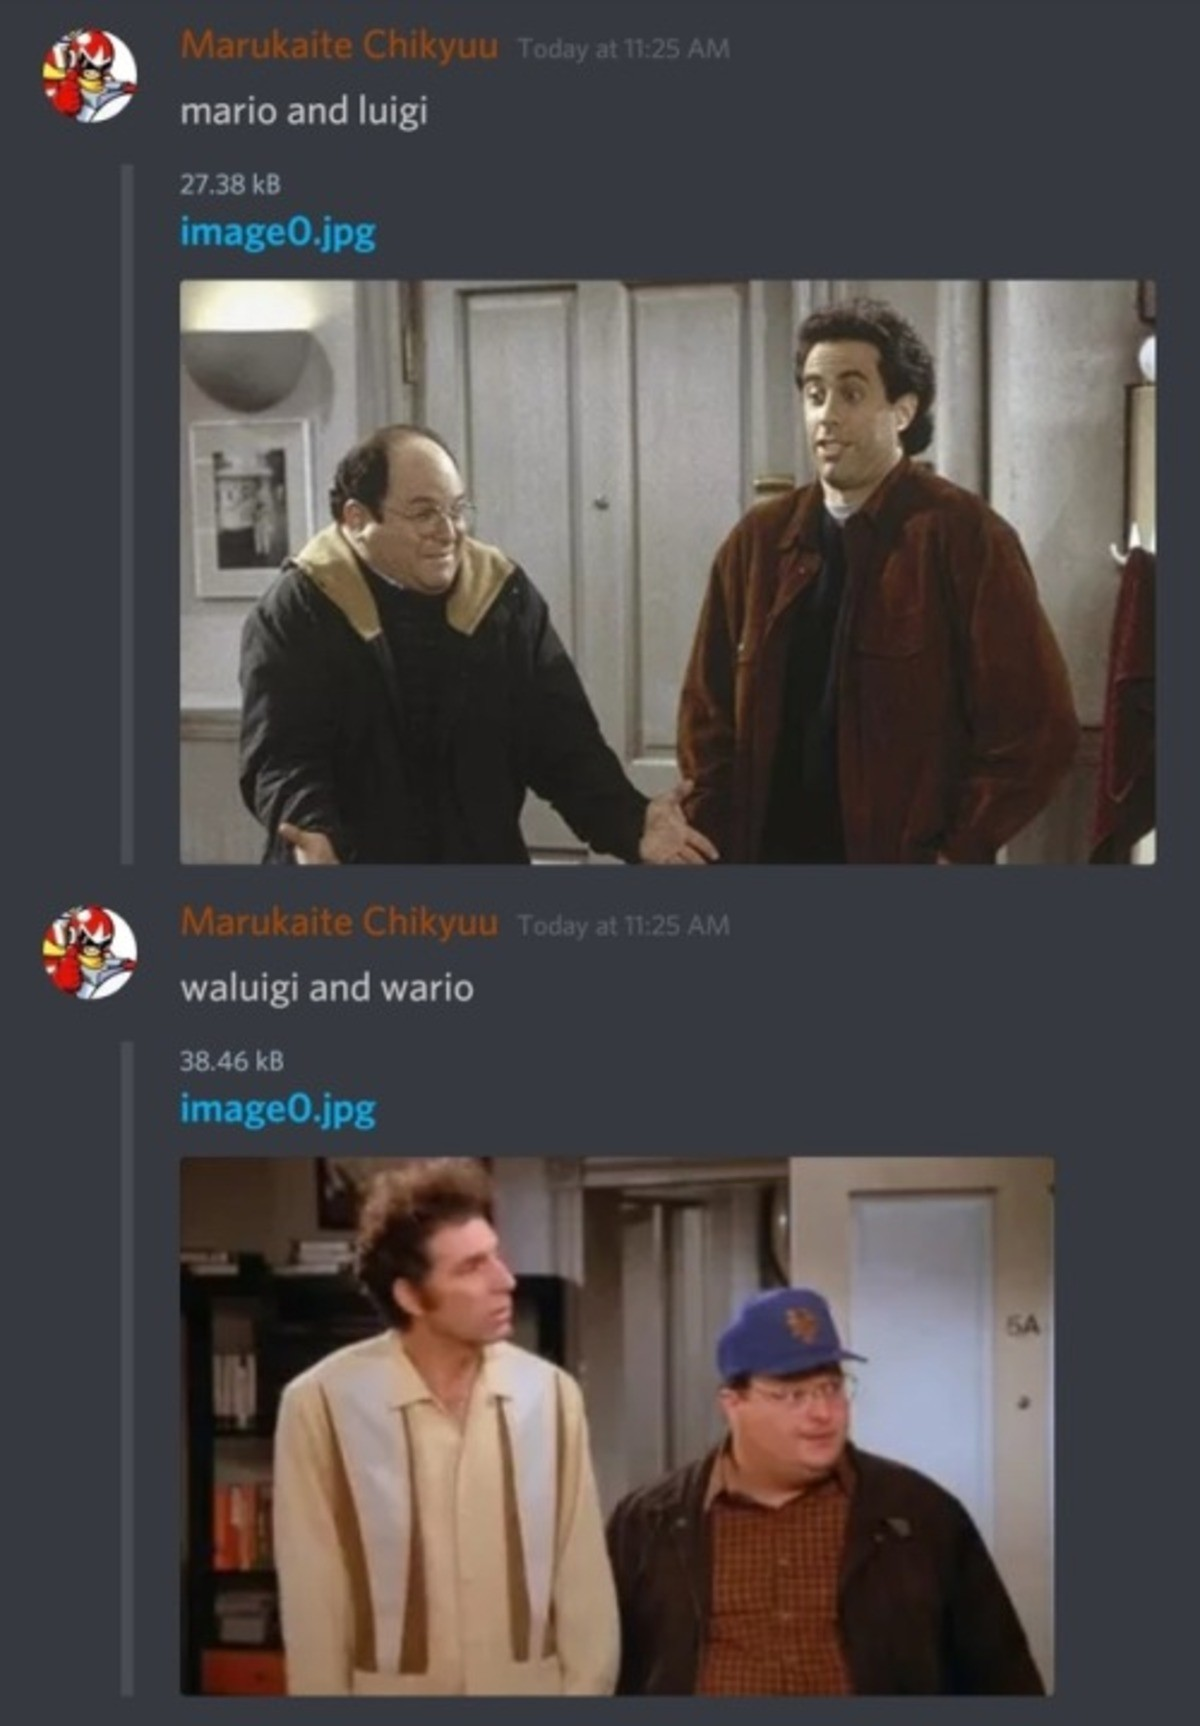 IT'S A MEEEE. .. I'm a simple man. I see Seinfeld, I thumb up.